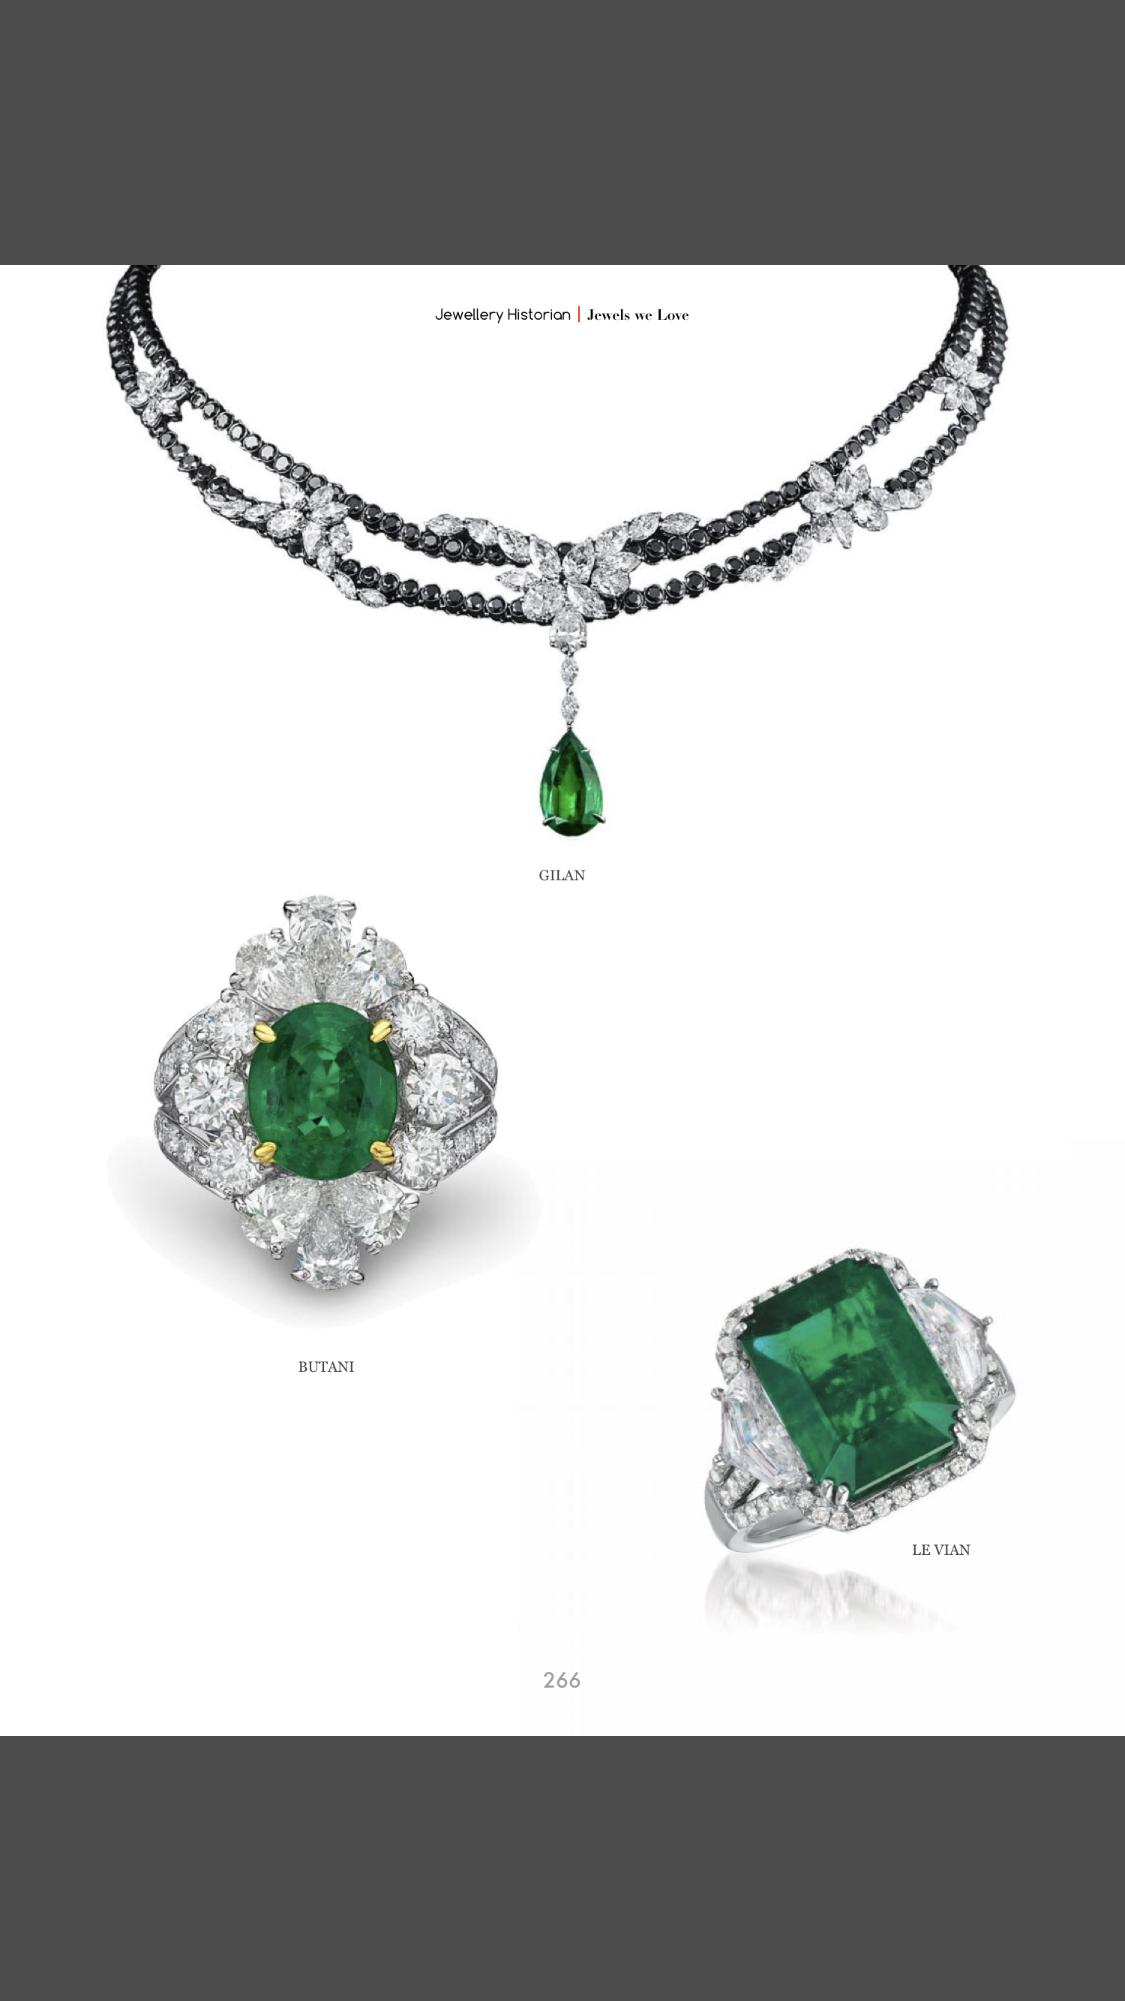 de6316edf1c30 Pin by Manoj kadel on Diamond necklaces colour stone & perls ...